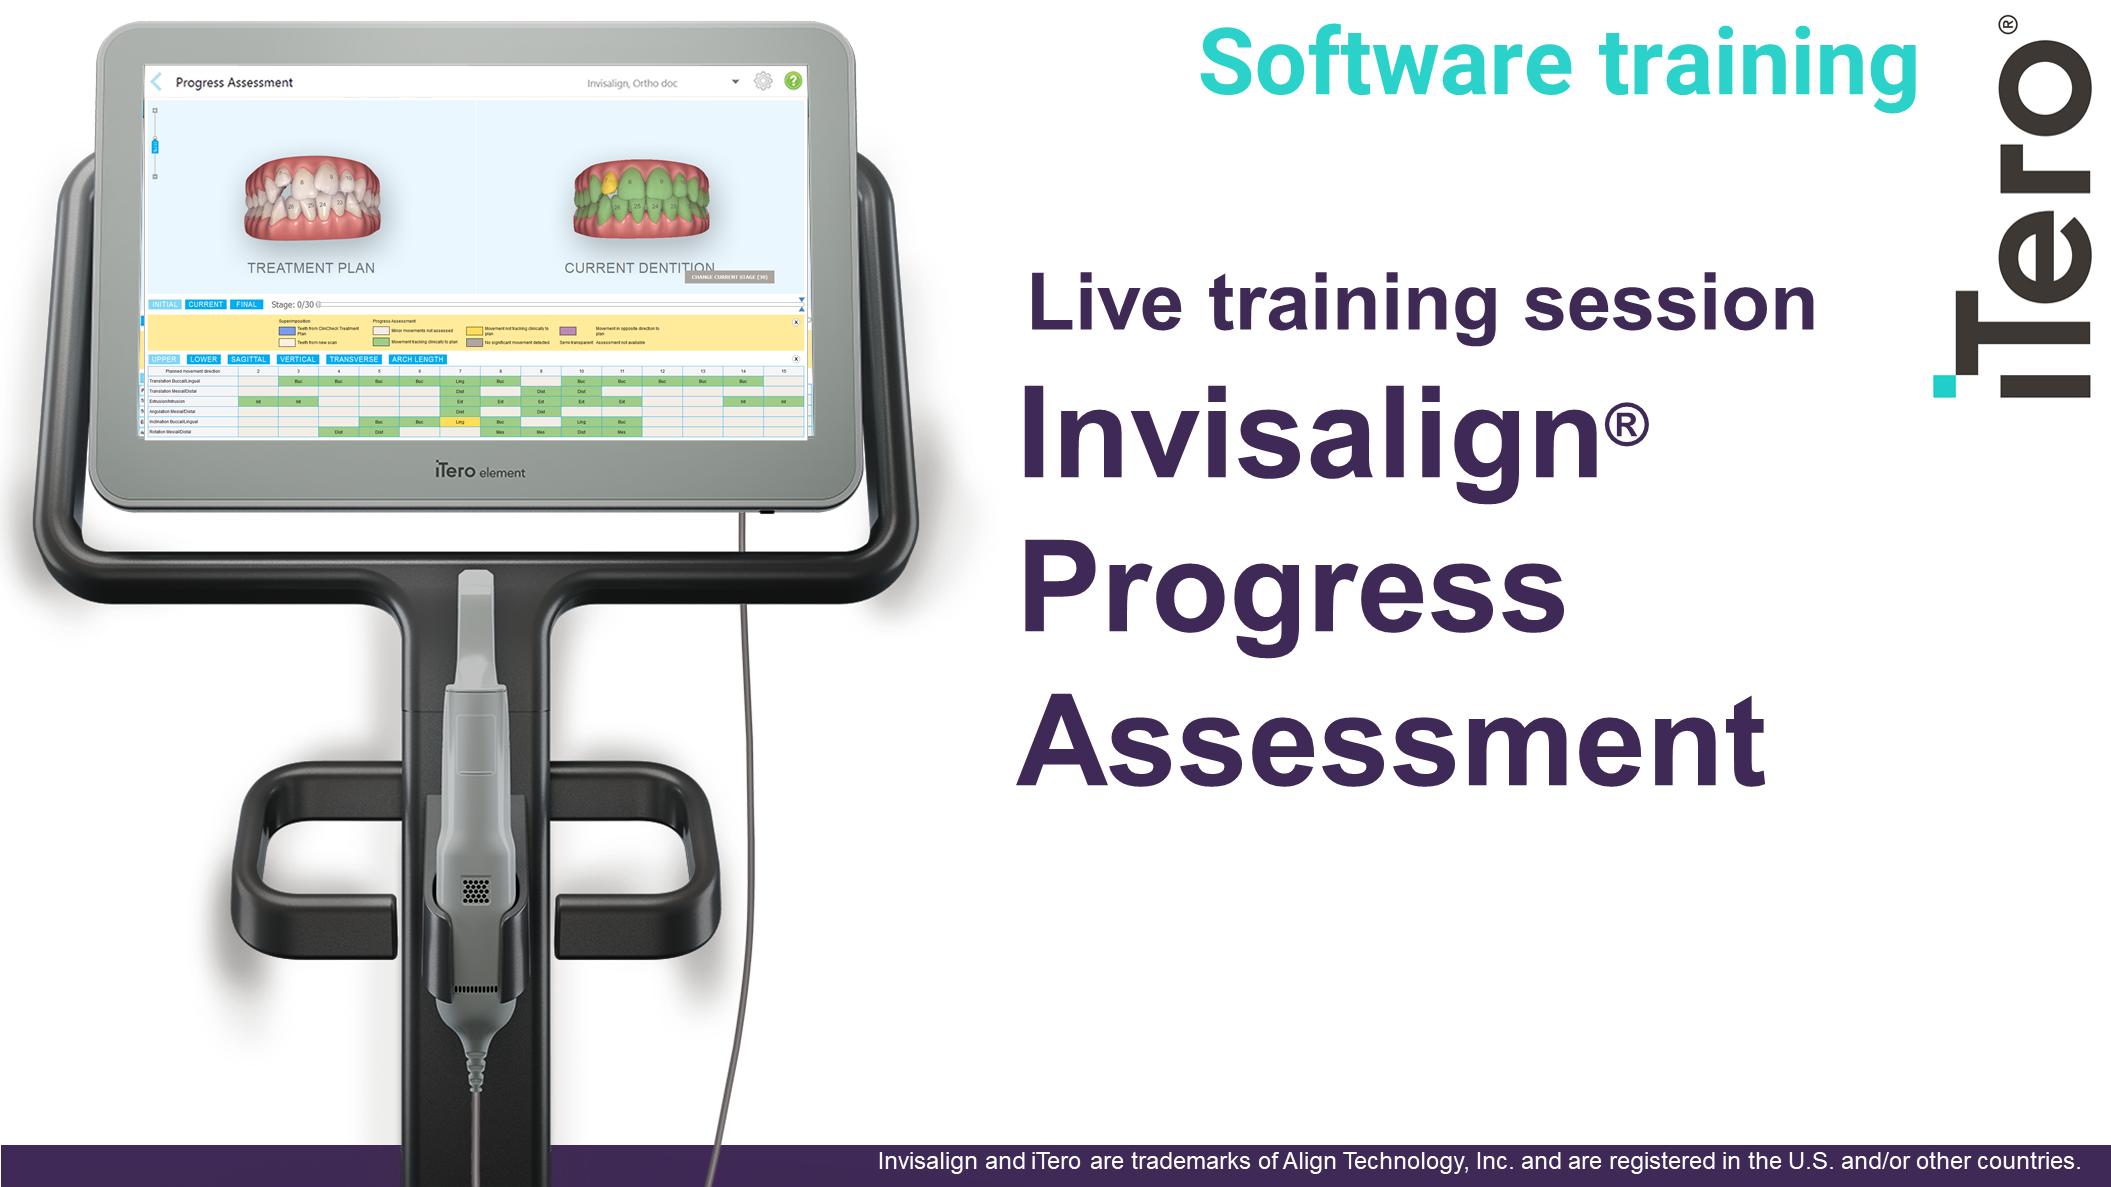 Invisalign Progress Assessment 12pmEDT(11amCT/10amMT/9amPT)